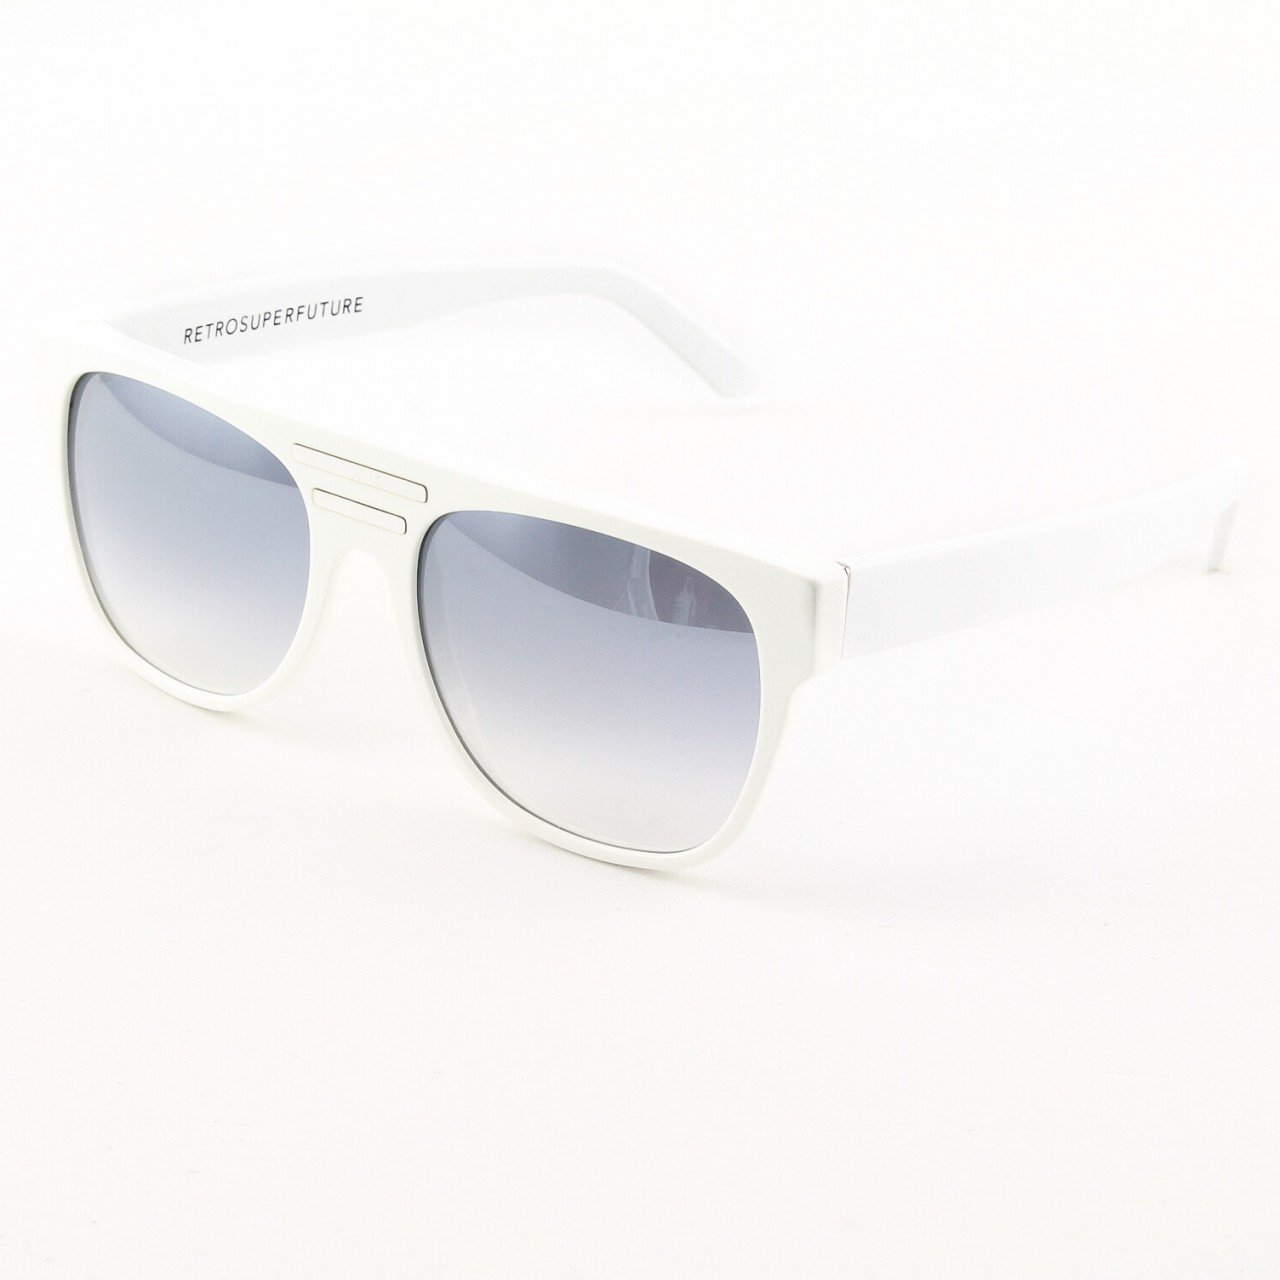 Super Topski 211 Sunglasses White with White Detachable Leather Sides  by RETROSUPERFUTURE